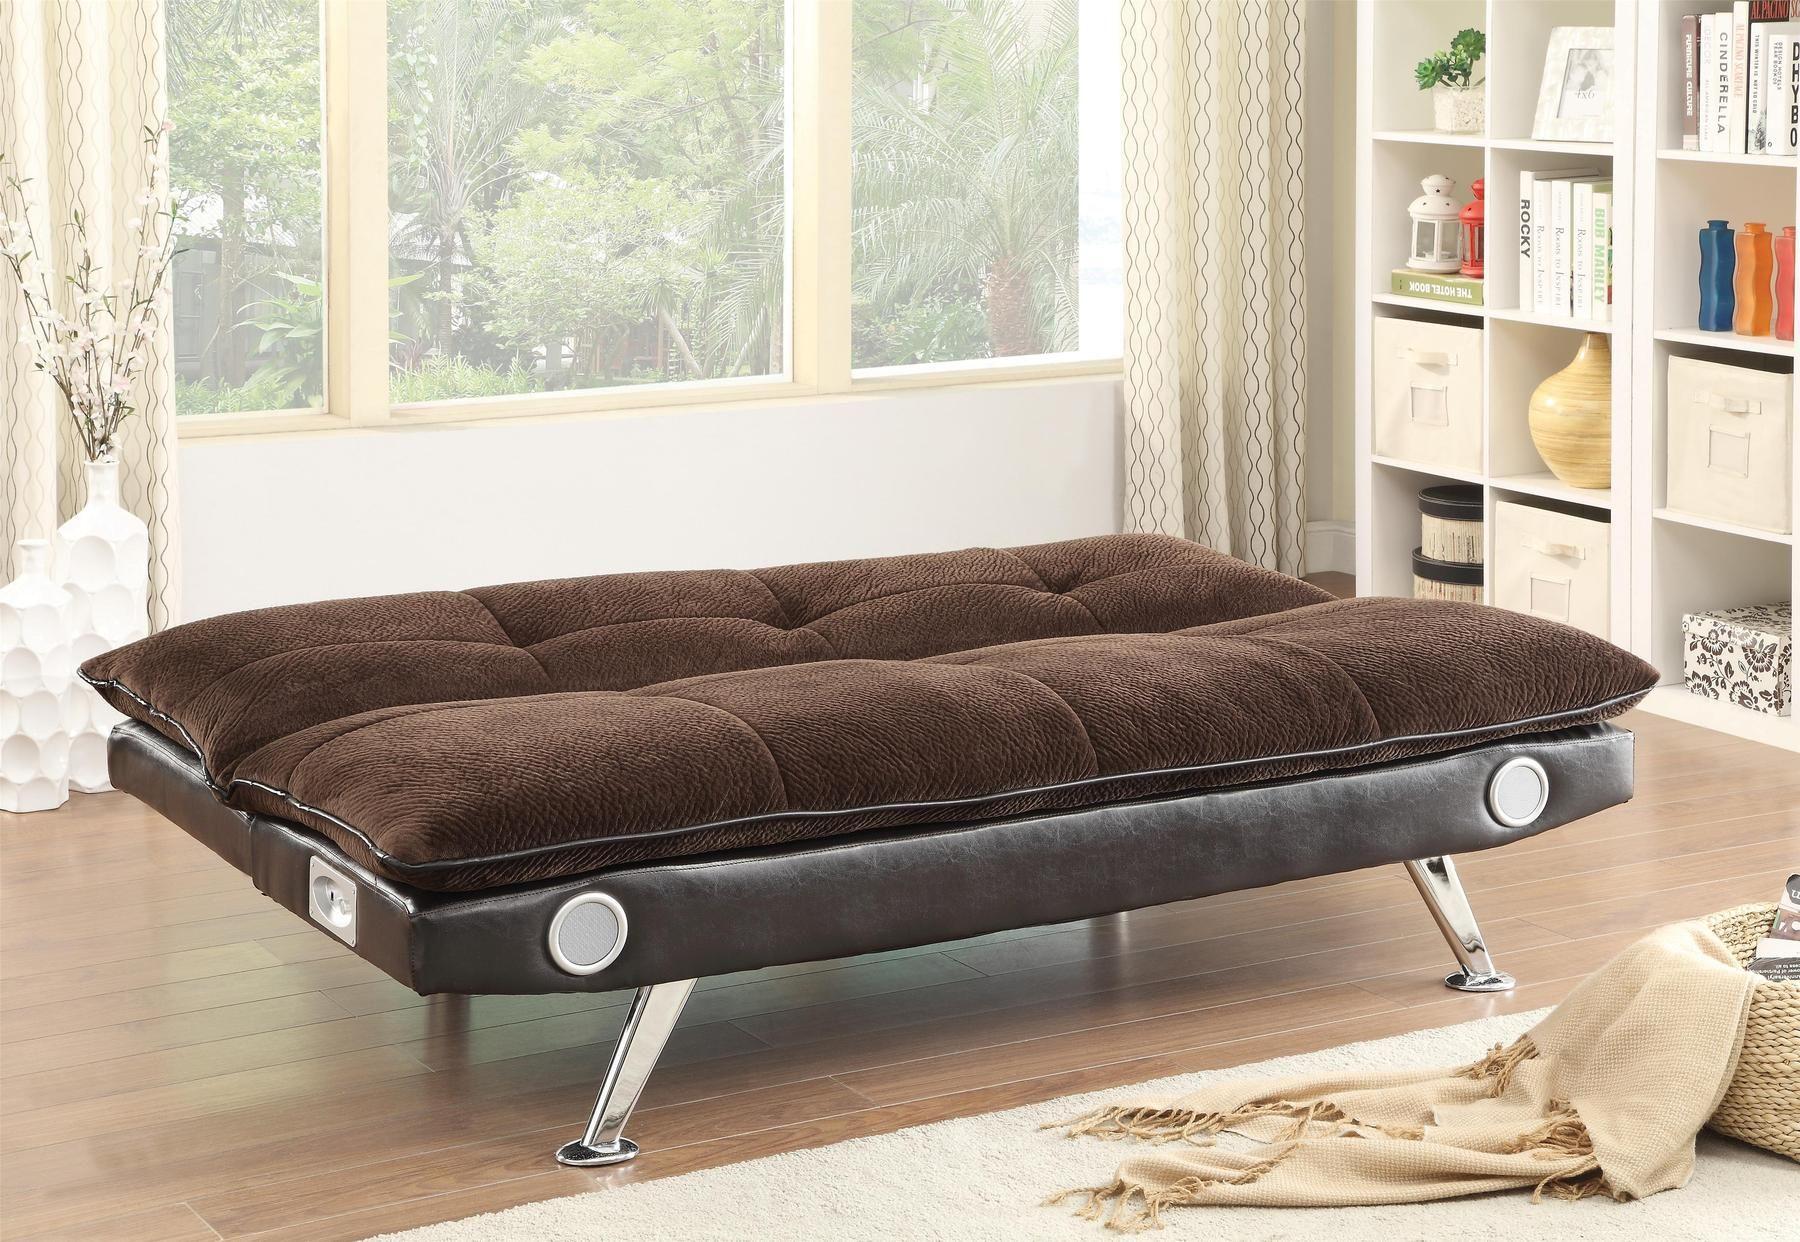 Cs047 Sofa Bed Sofa Bed Velvet Sofa Bed Futon Sofa Bed